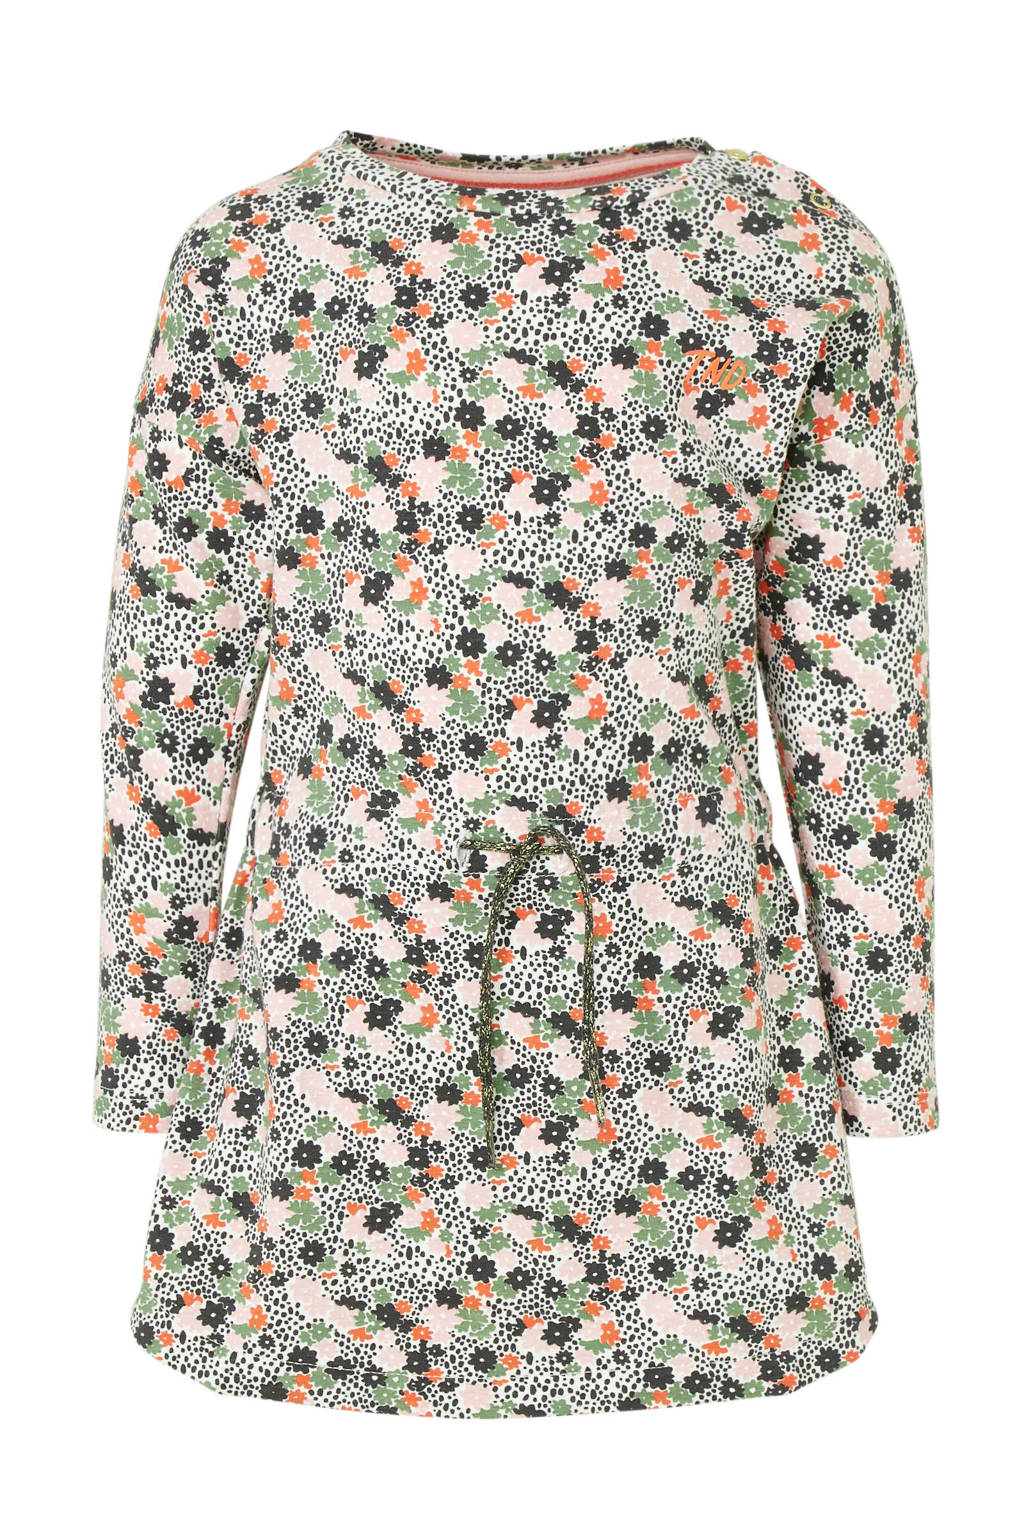 Tumble 'n Dry Lo gebloemde jersey jurk Maike groen/lichtroze/koraalrood, Groen/lichtroze/koraalrood